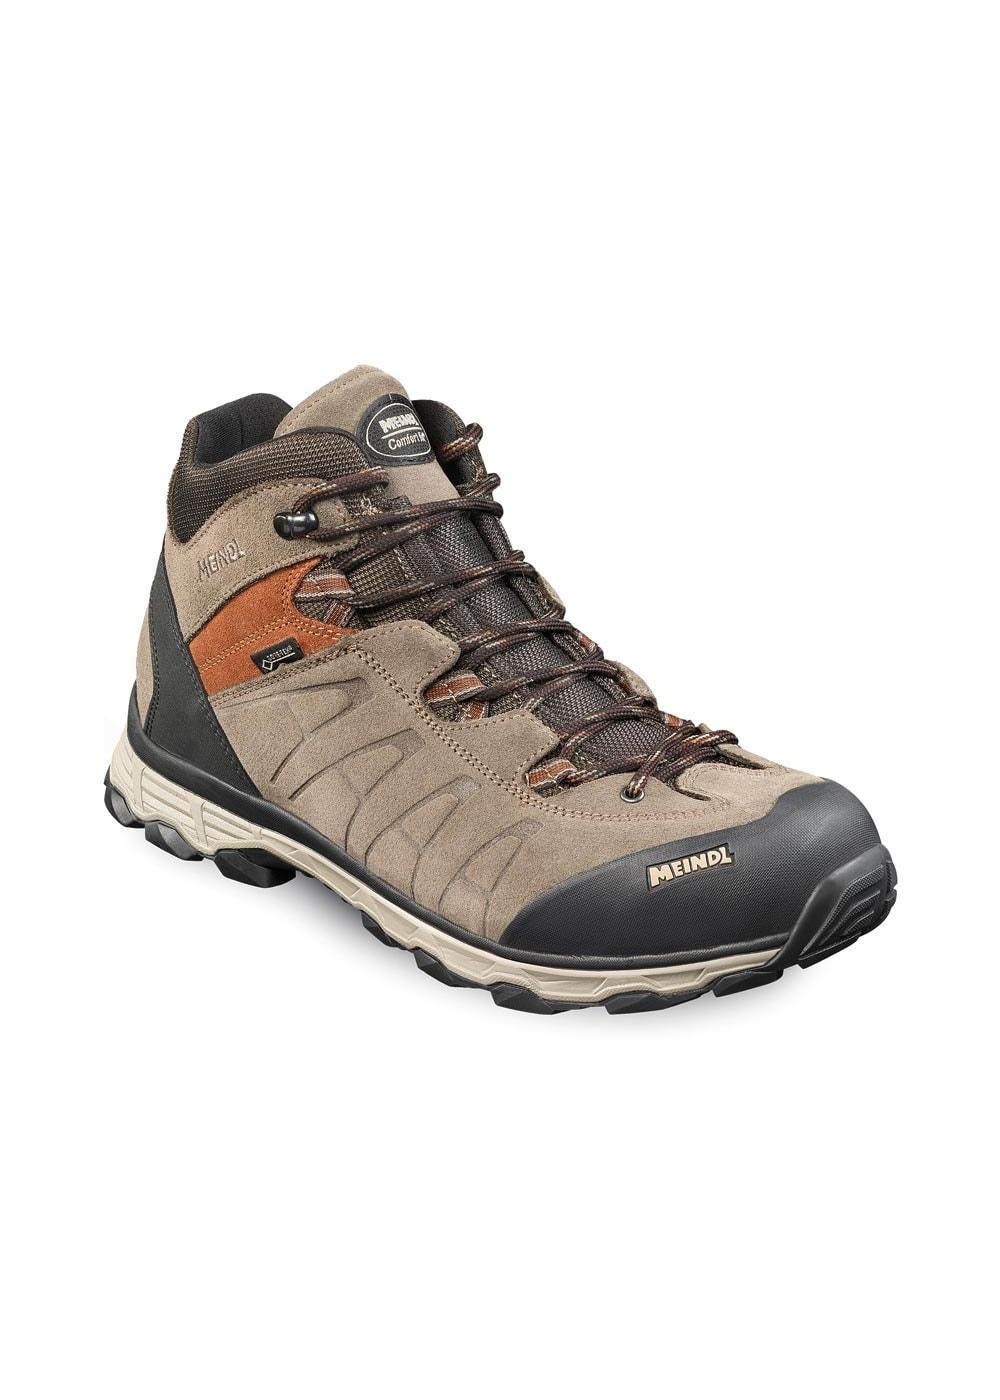 Various colors Meindl WENGEN LADY PRO Natural Shoes Hiking shoes Women US 5 5 6 5 7 8 8 5